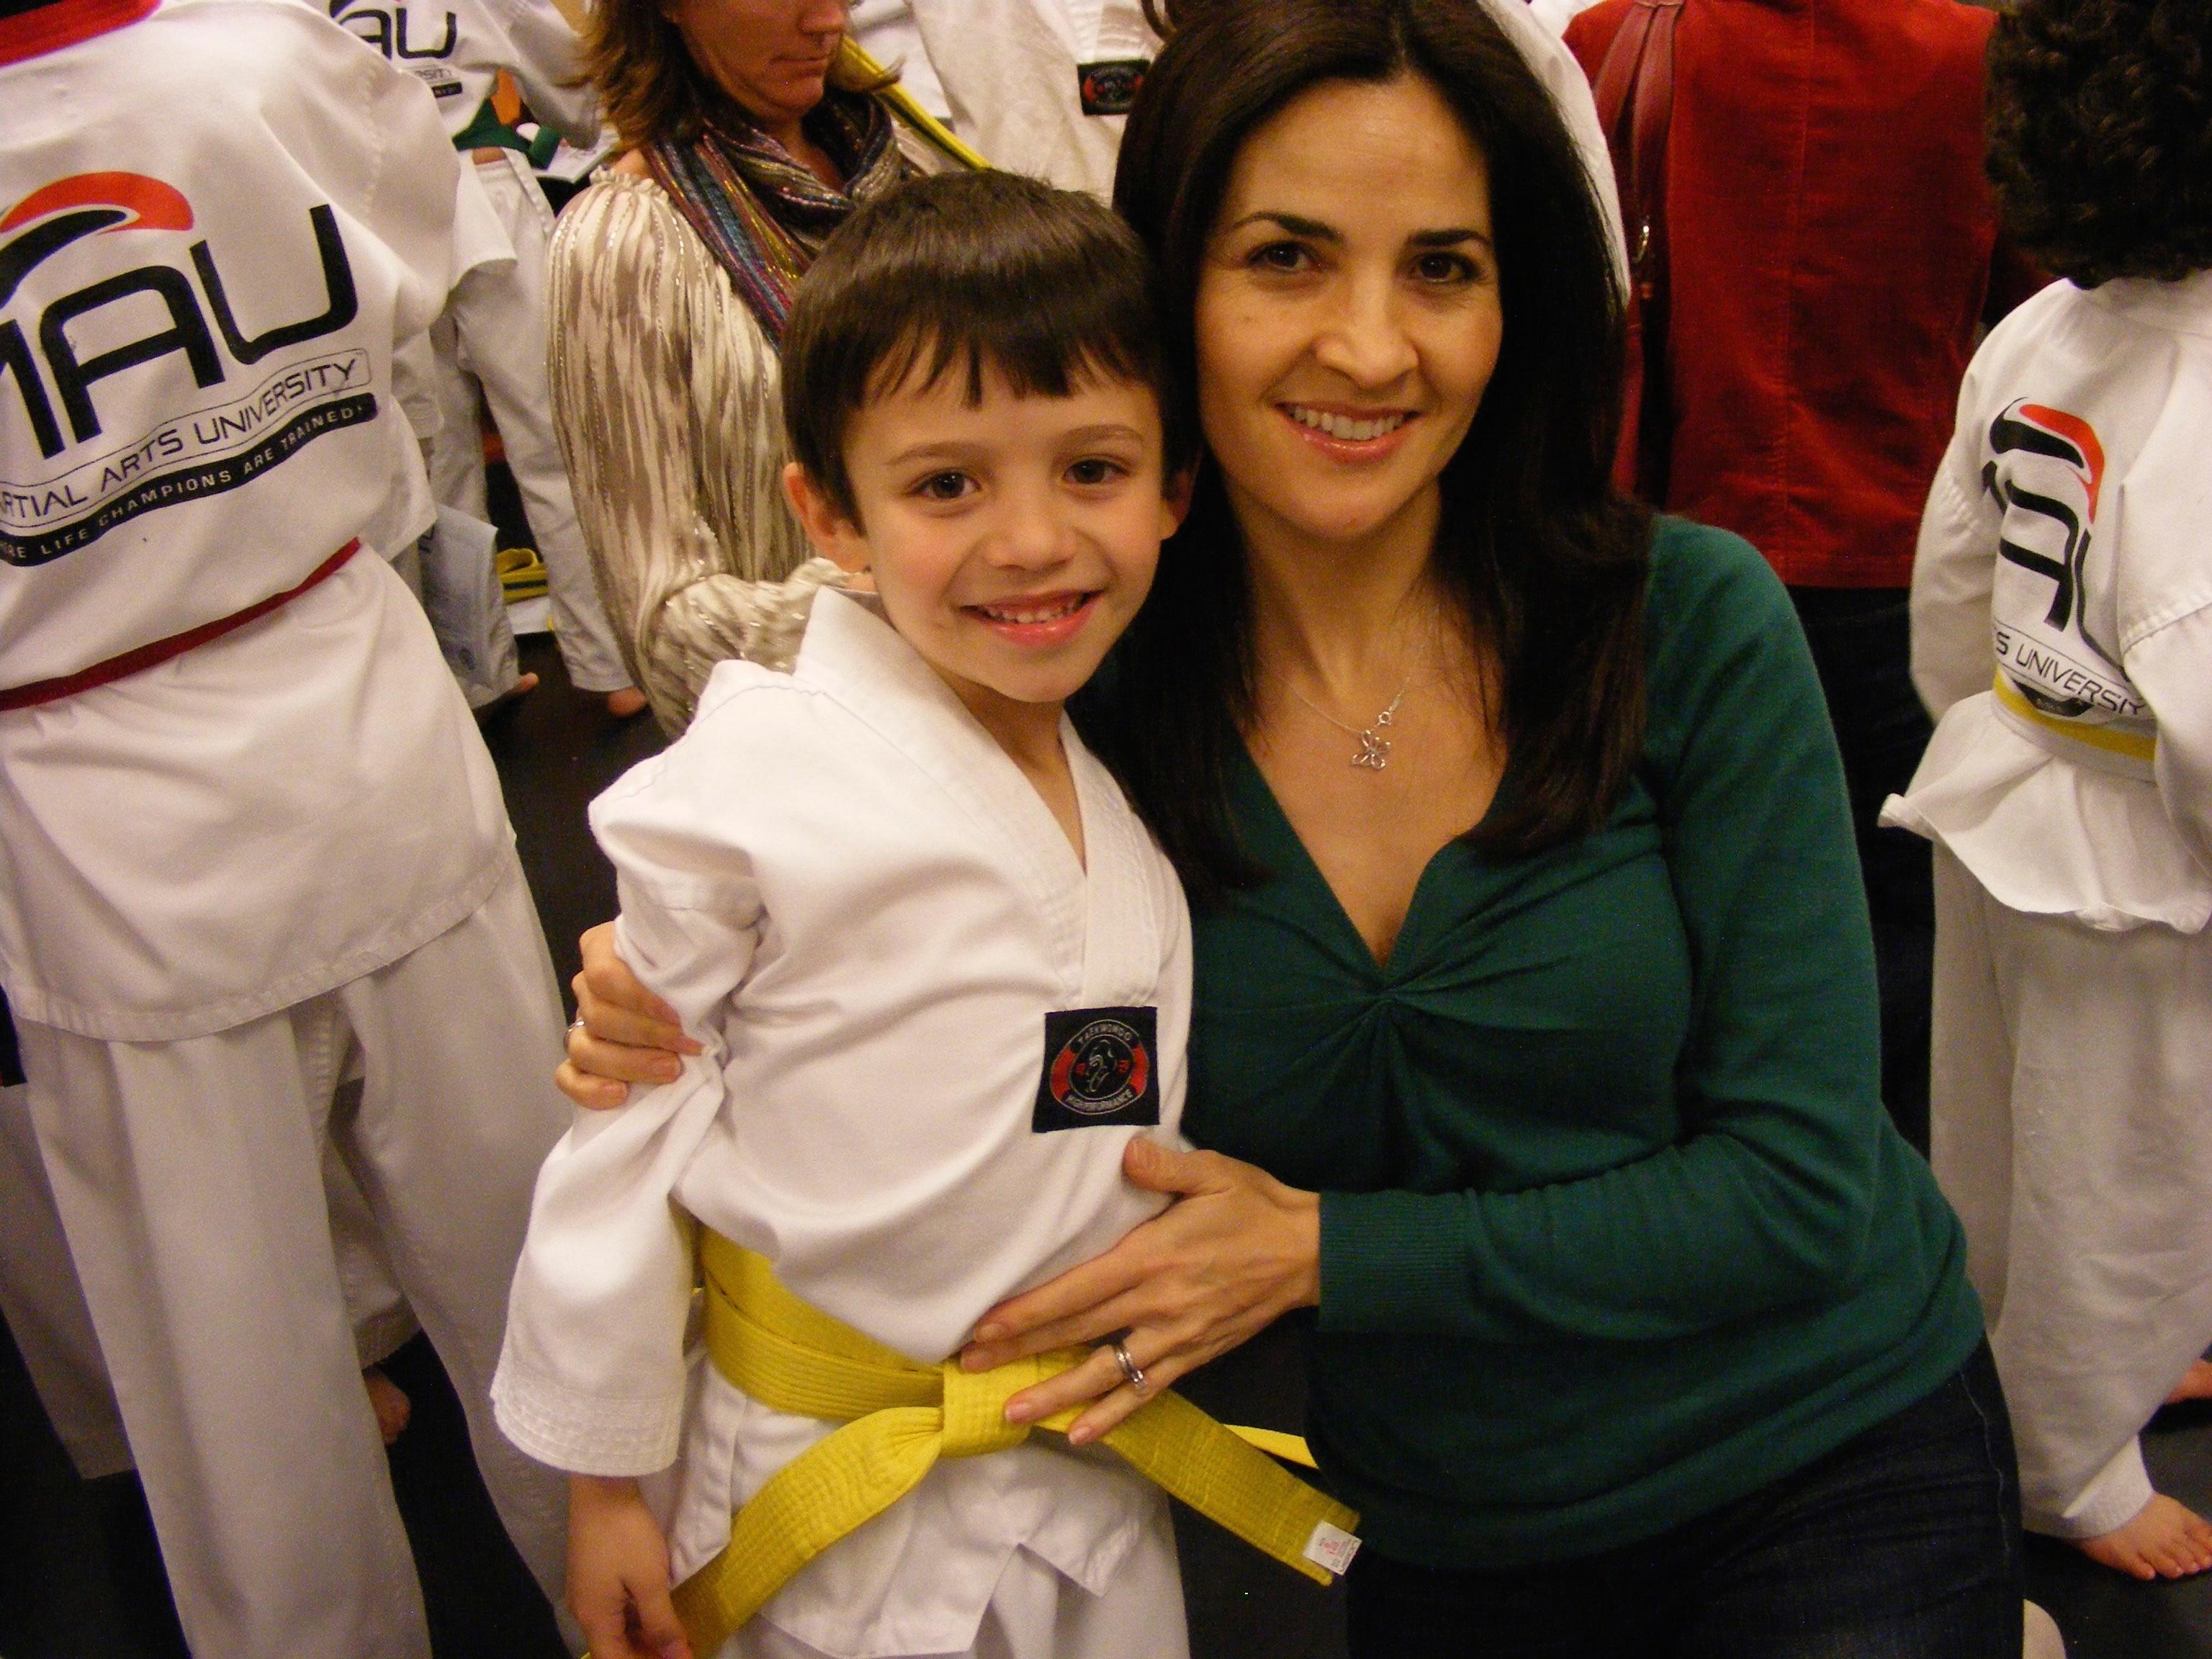 Martial Arts University image 4